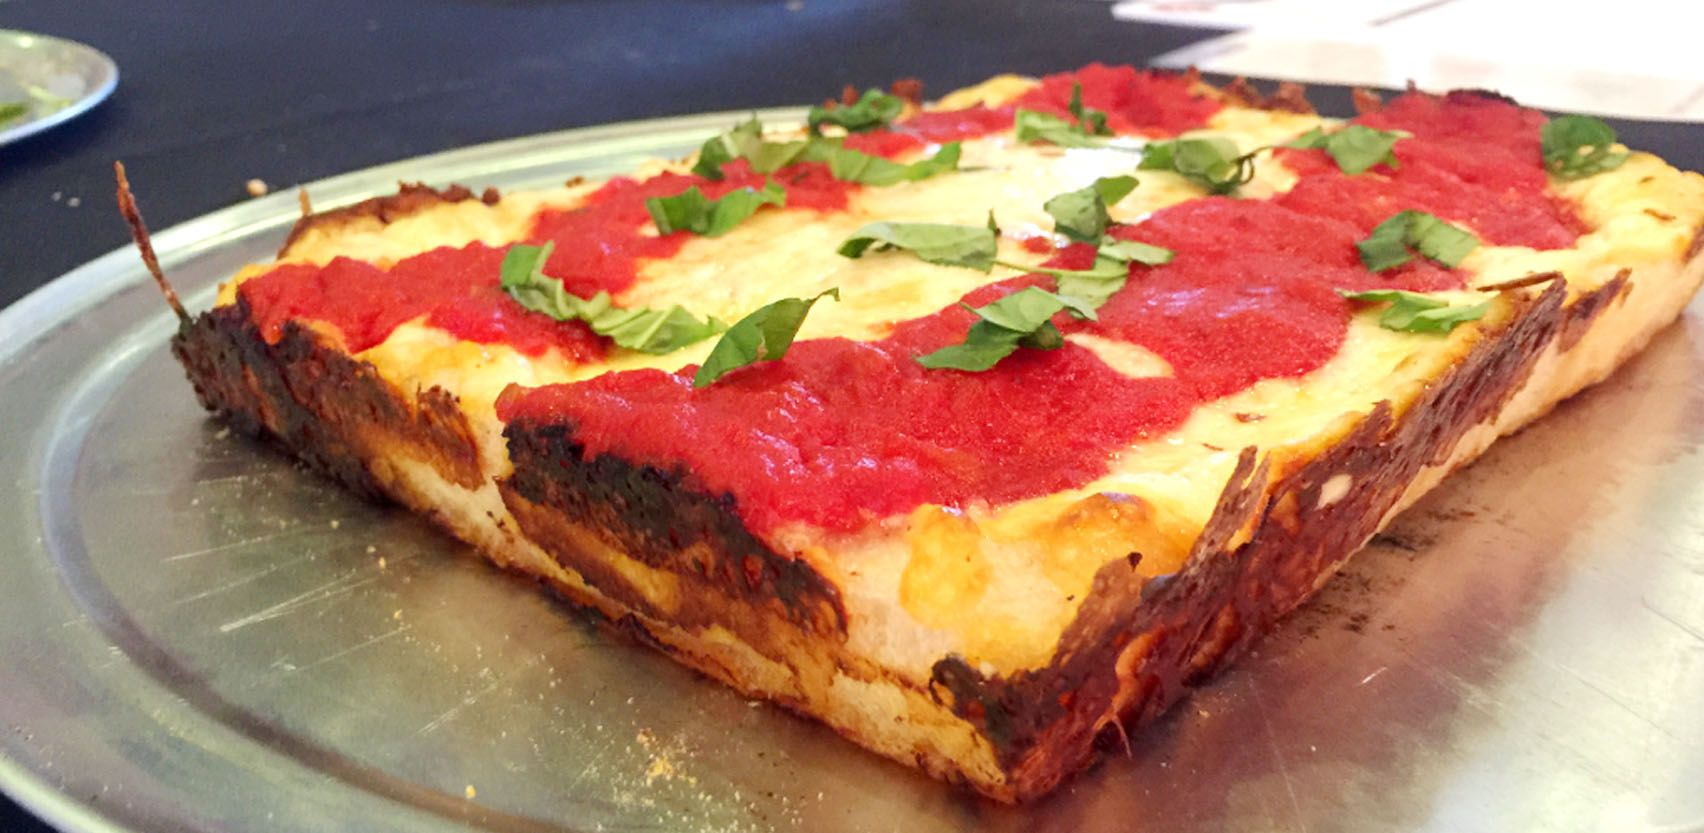 Gluten Free Pan Pizza Orlando Food Sales Recipe in